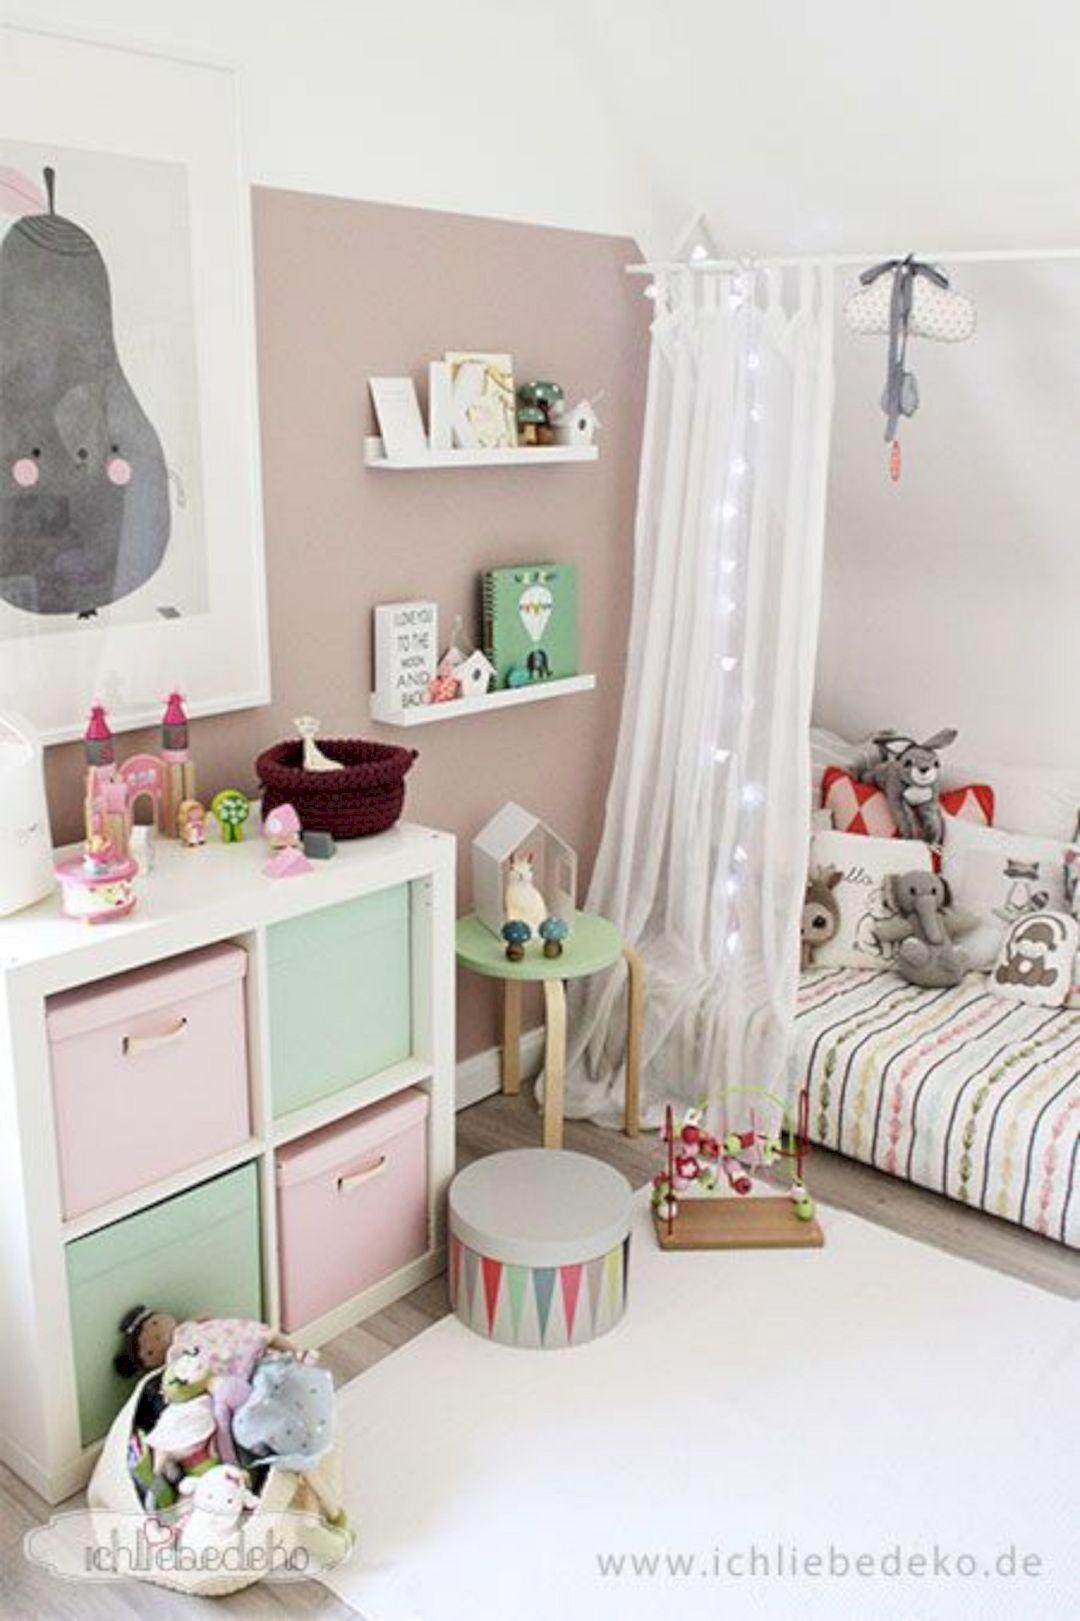 Kids Room Interior Design Ideas: What To Consider When Designing Boys Bedroom Interior